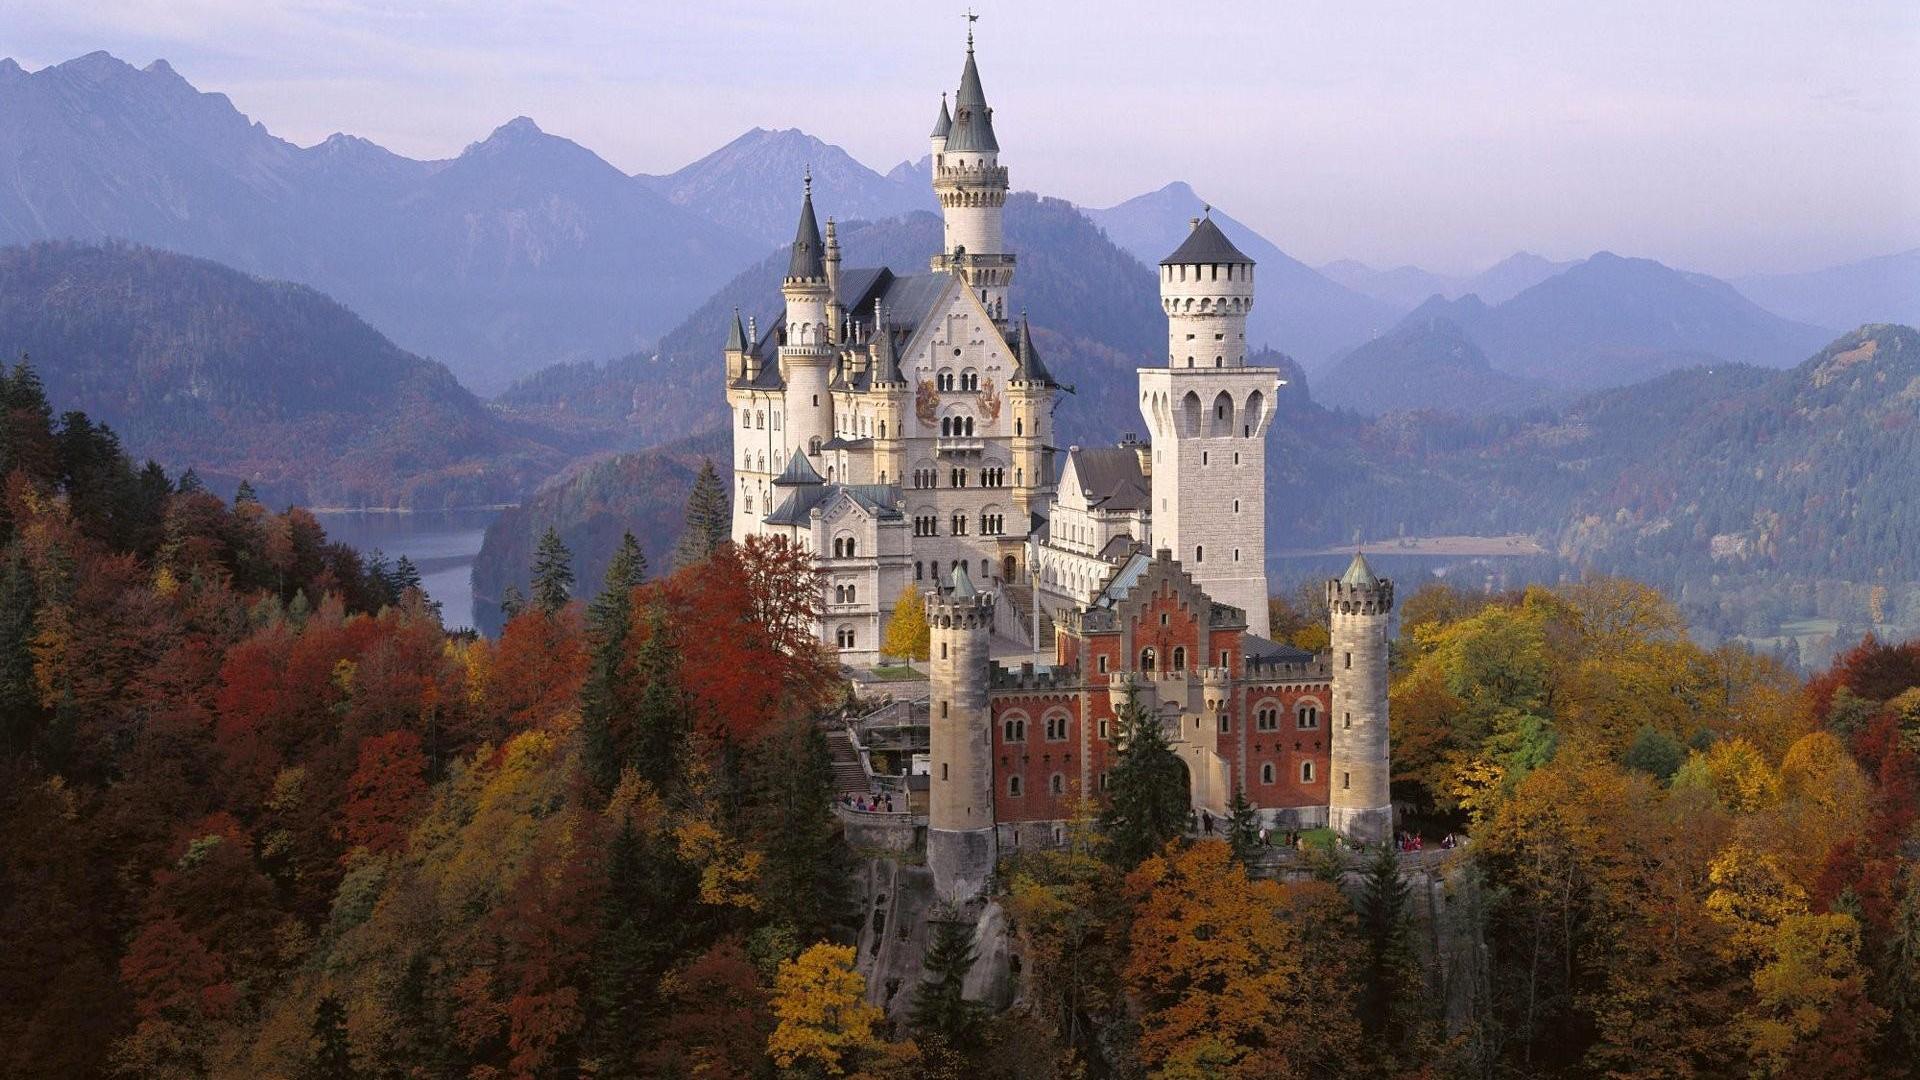 neuschwanstein castle full hd wallpaper and background